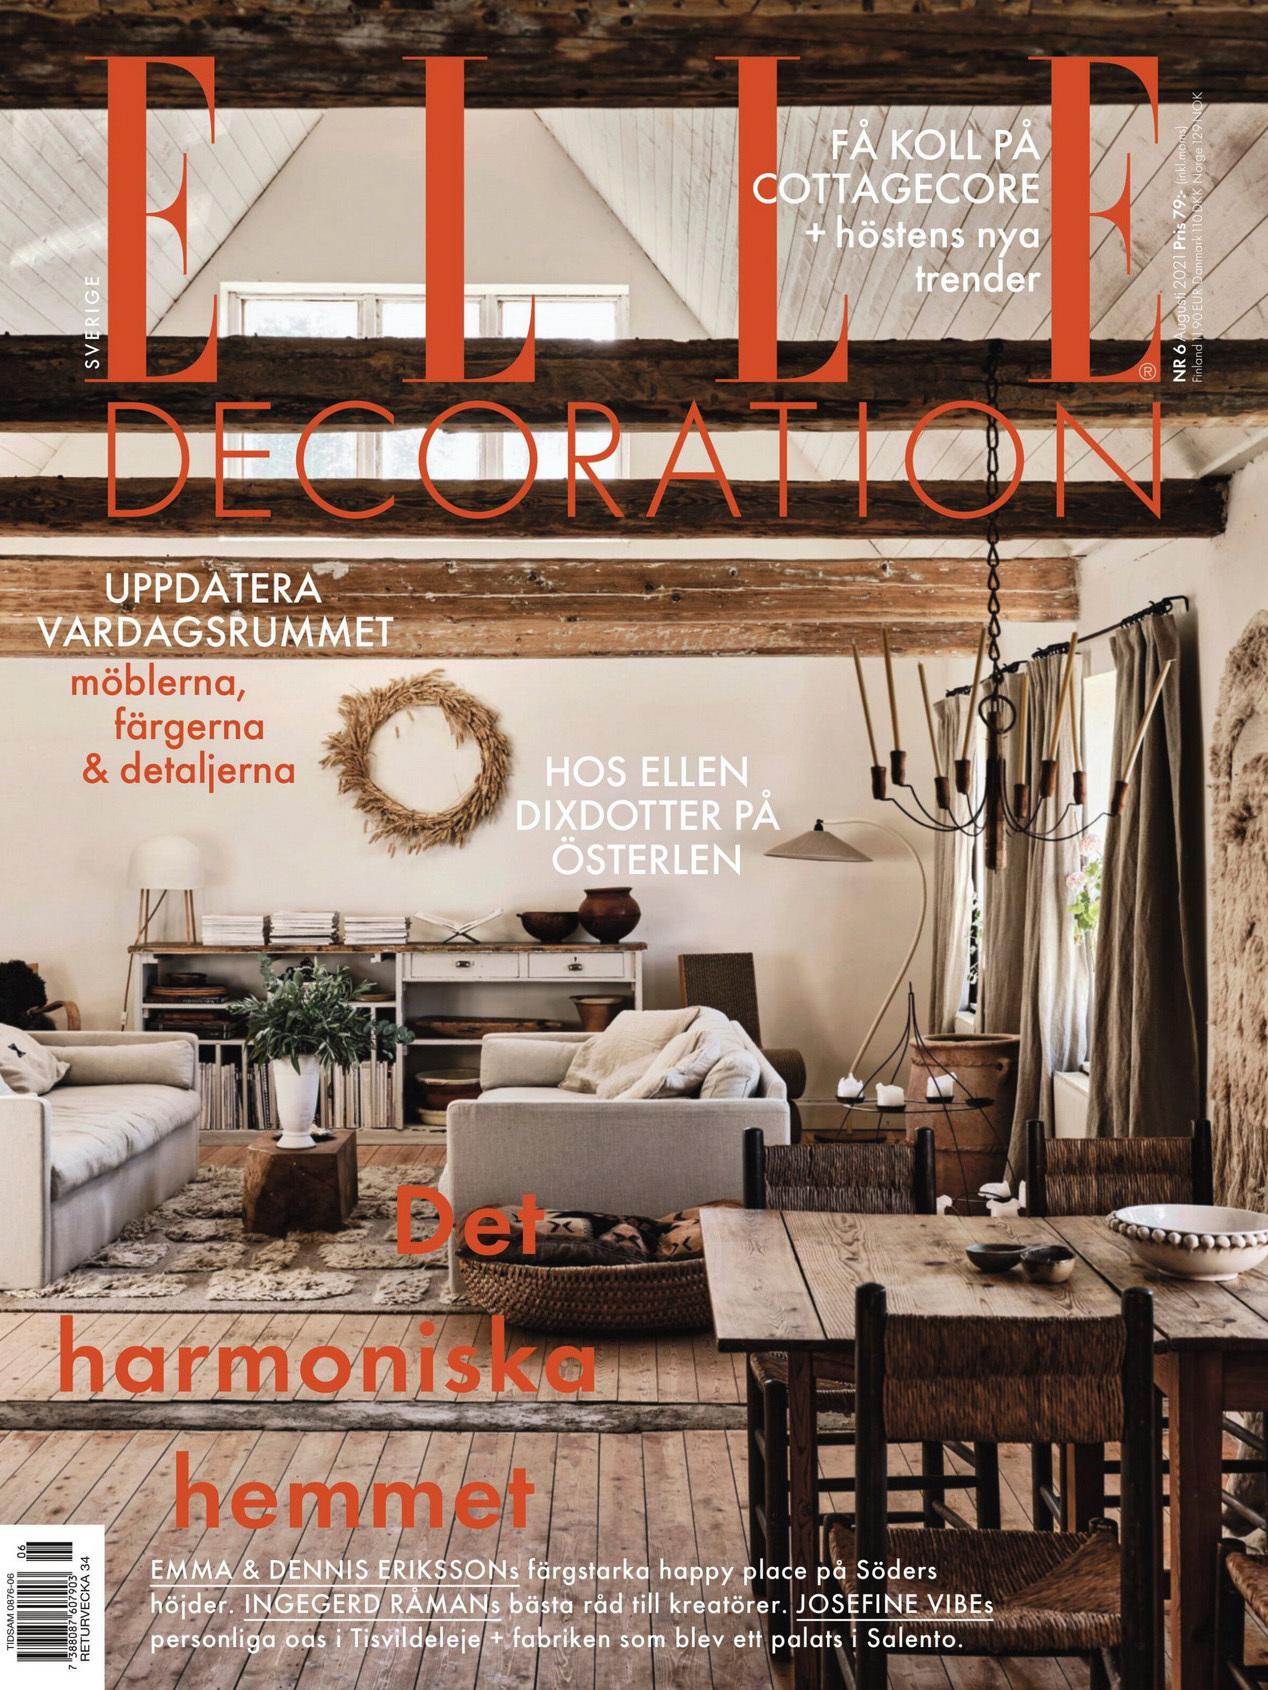 《Elle Decoration》瑞典家居装饰杂志2021年08月号